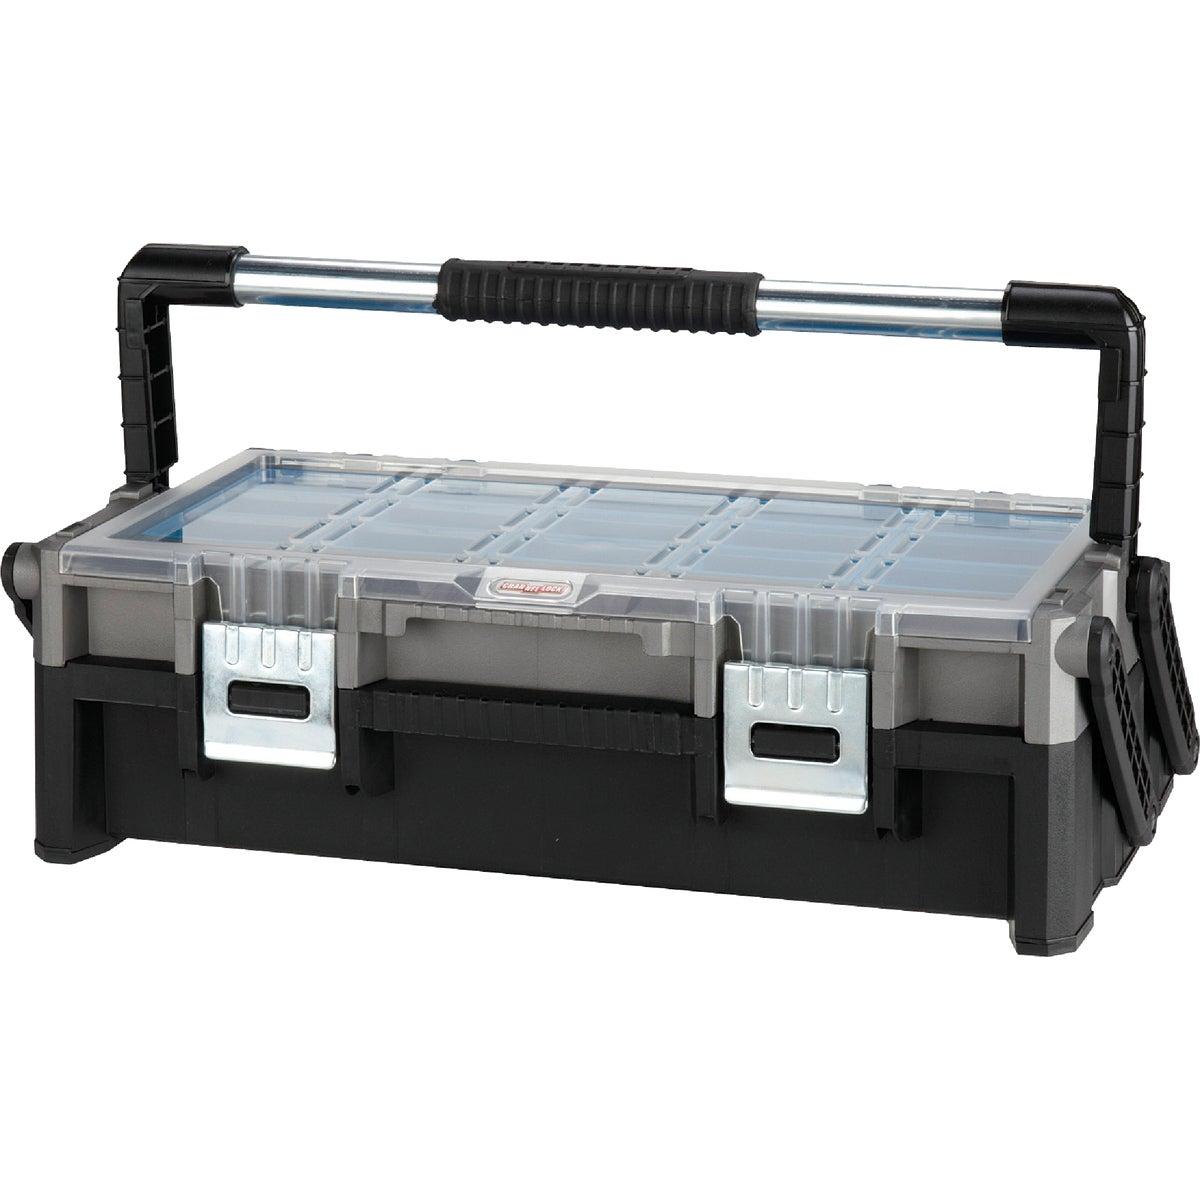 Channellock 22.5 In. Cantilever Parts Organizer Storage Box